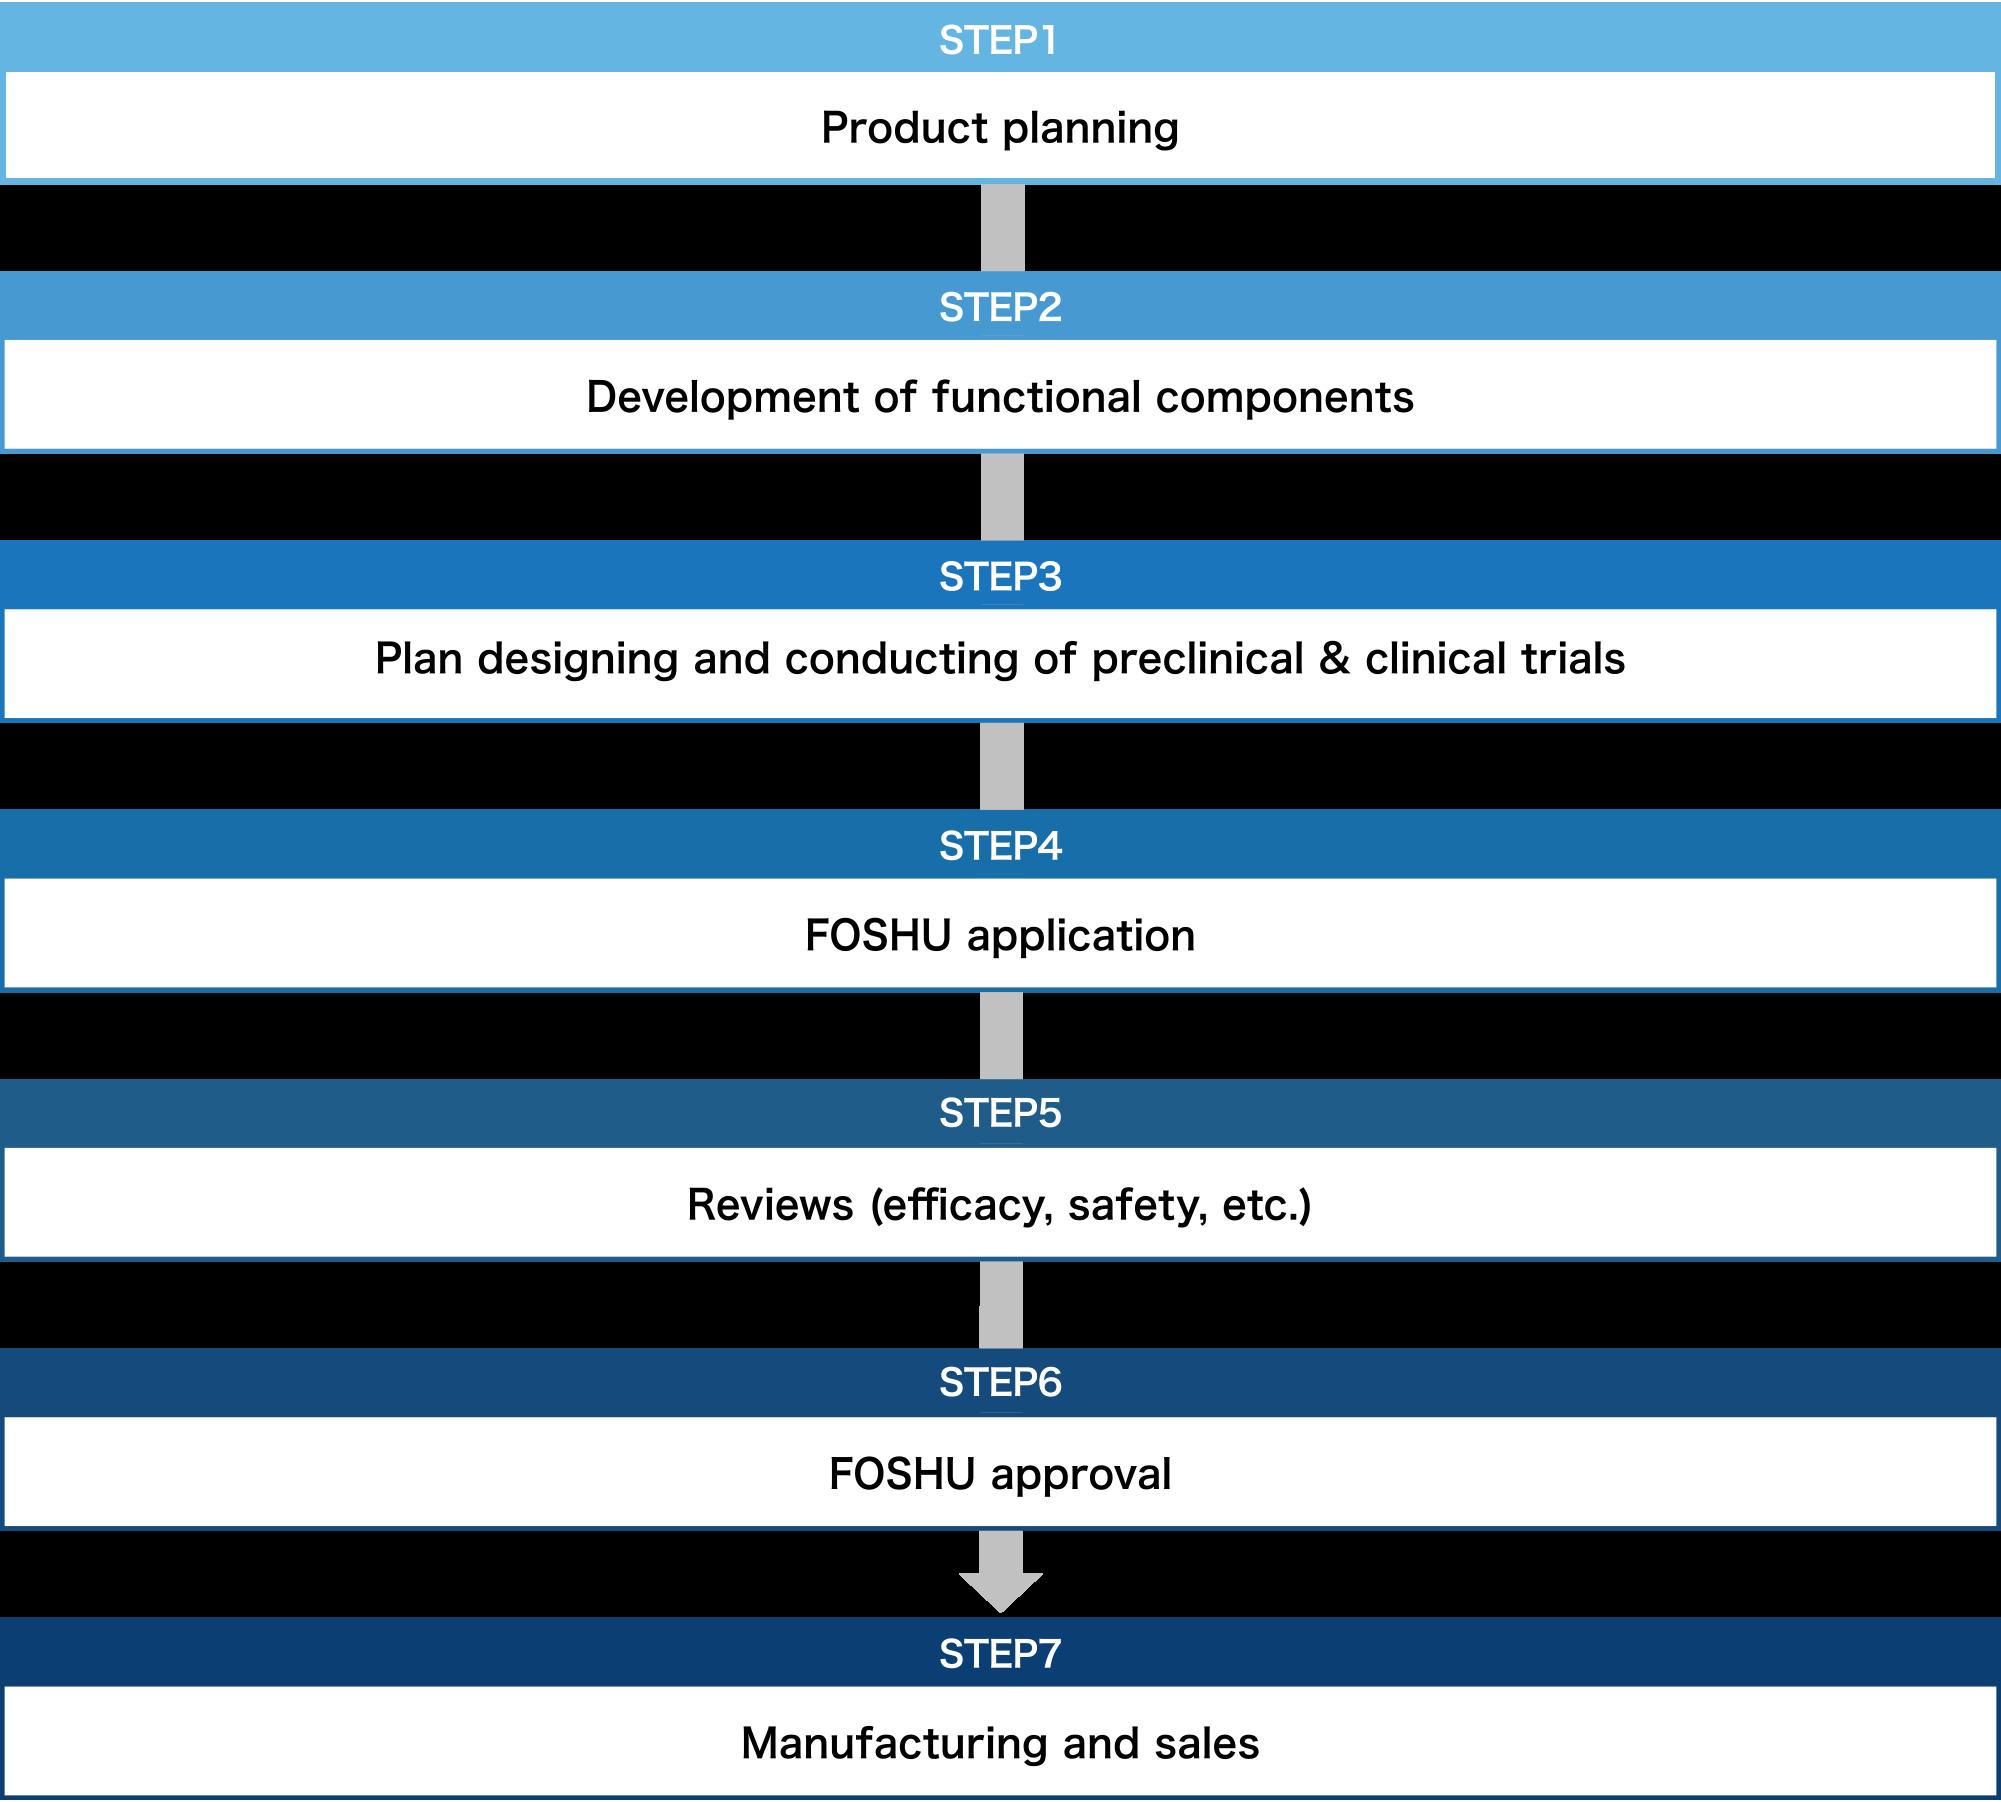 Necessary process for FOSHU development